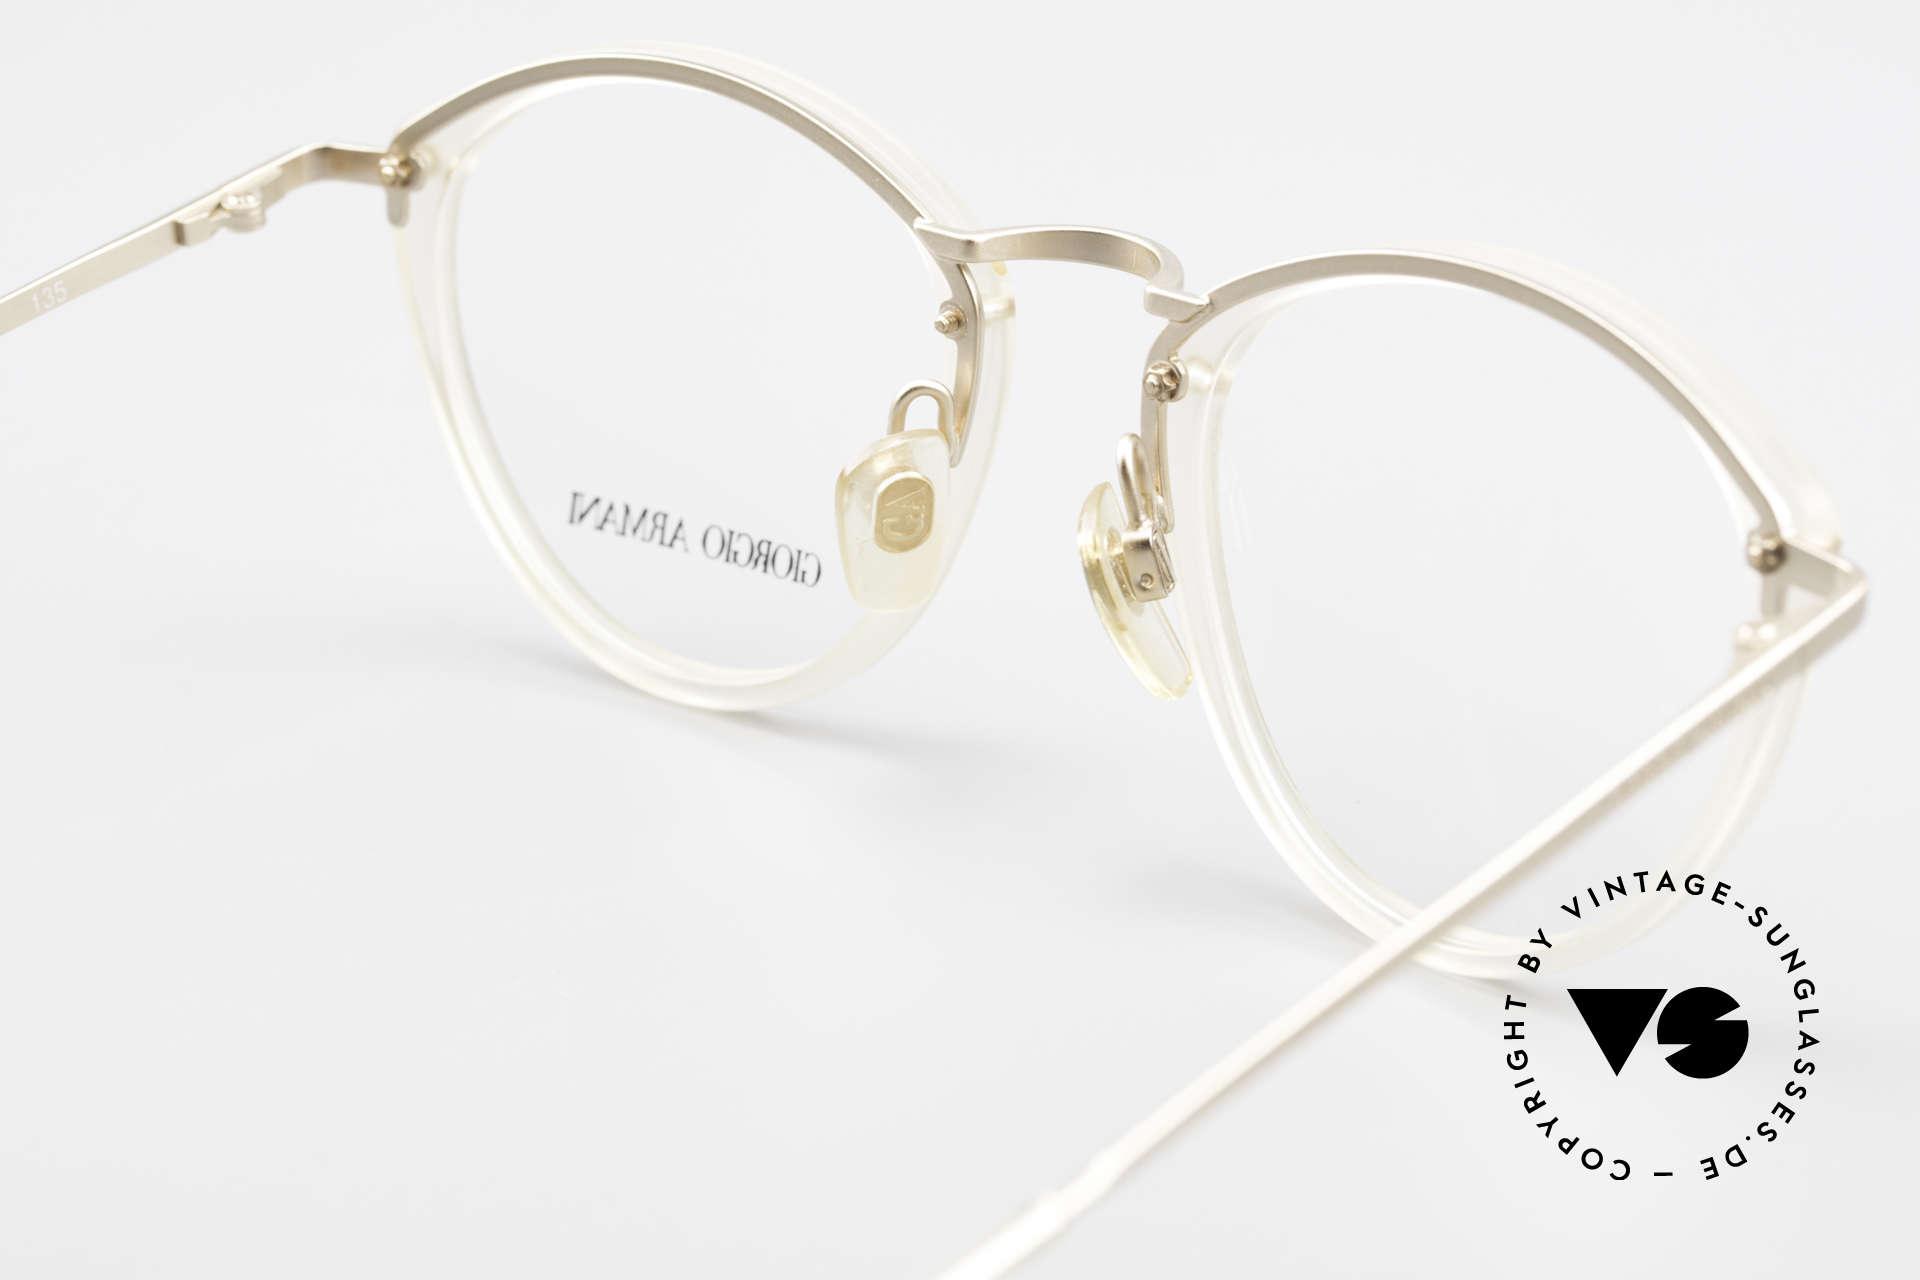 Giorgio Armani 354 80s Designer Glasses Vintage, Size: medium, Made for Men and Women